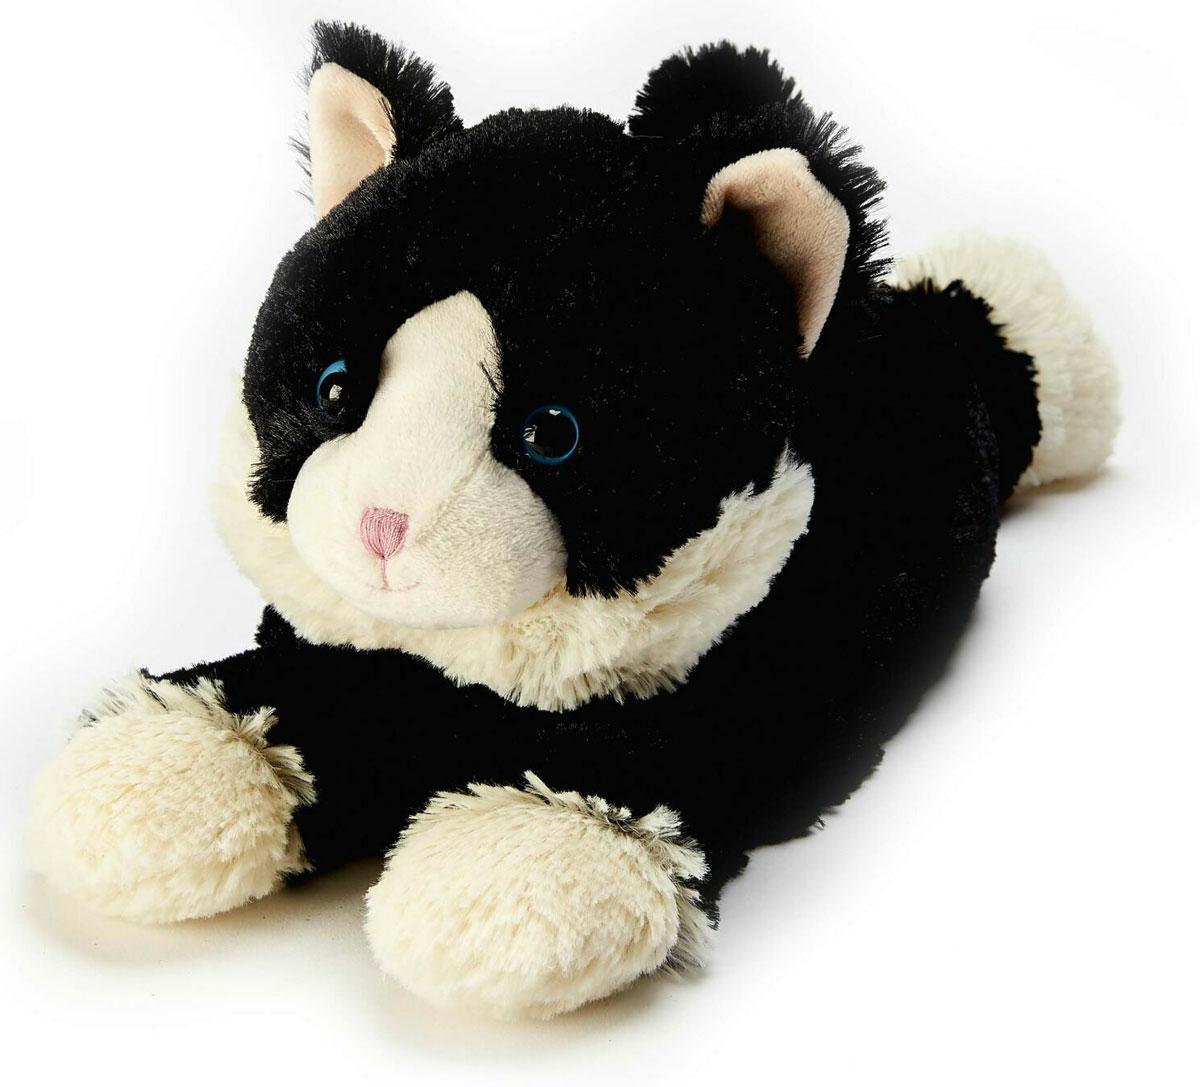 Warmies Игрушка-грелка Черная Киса грелки warmies cozy plush игрушка грелка лиса